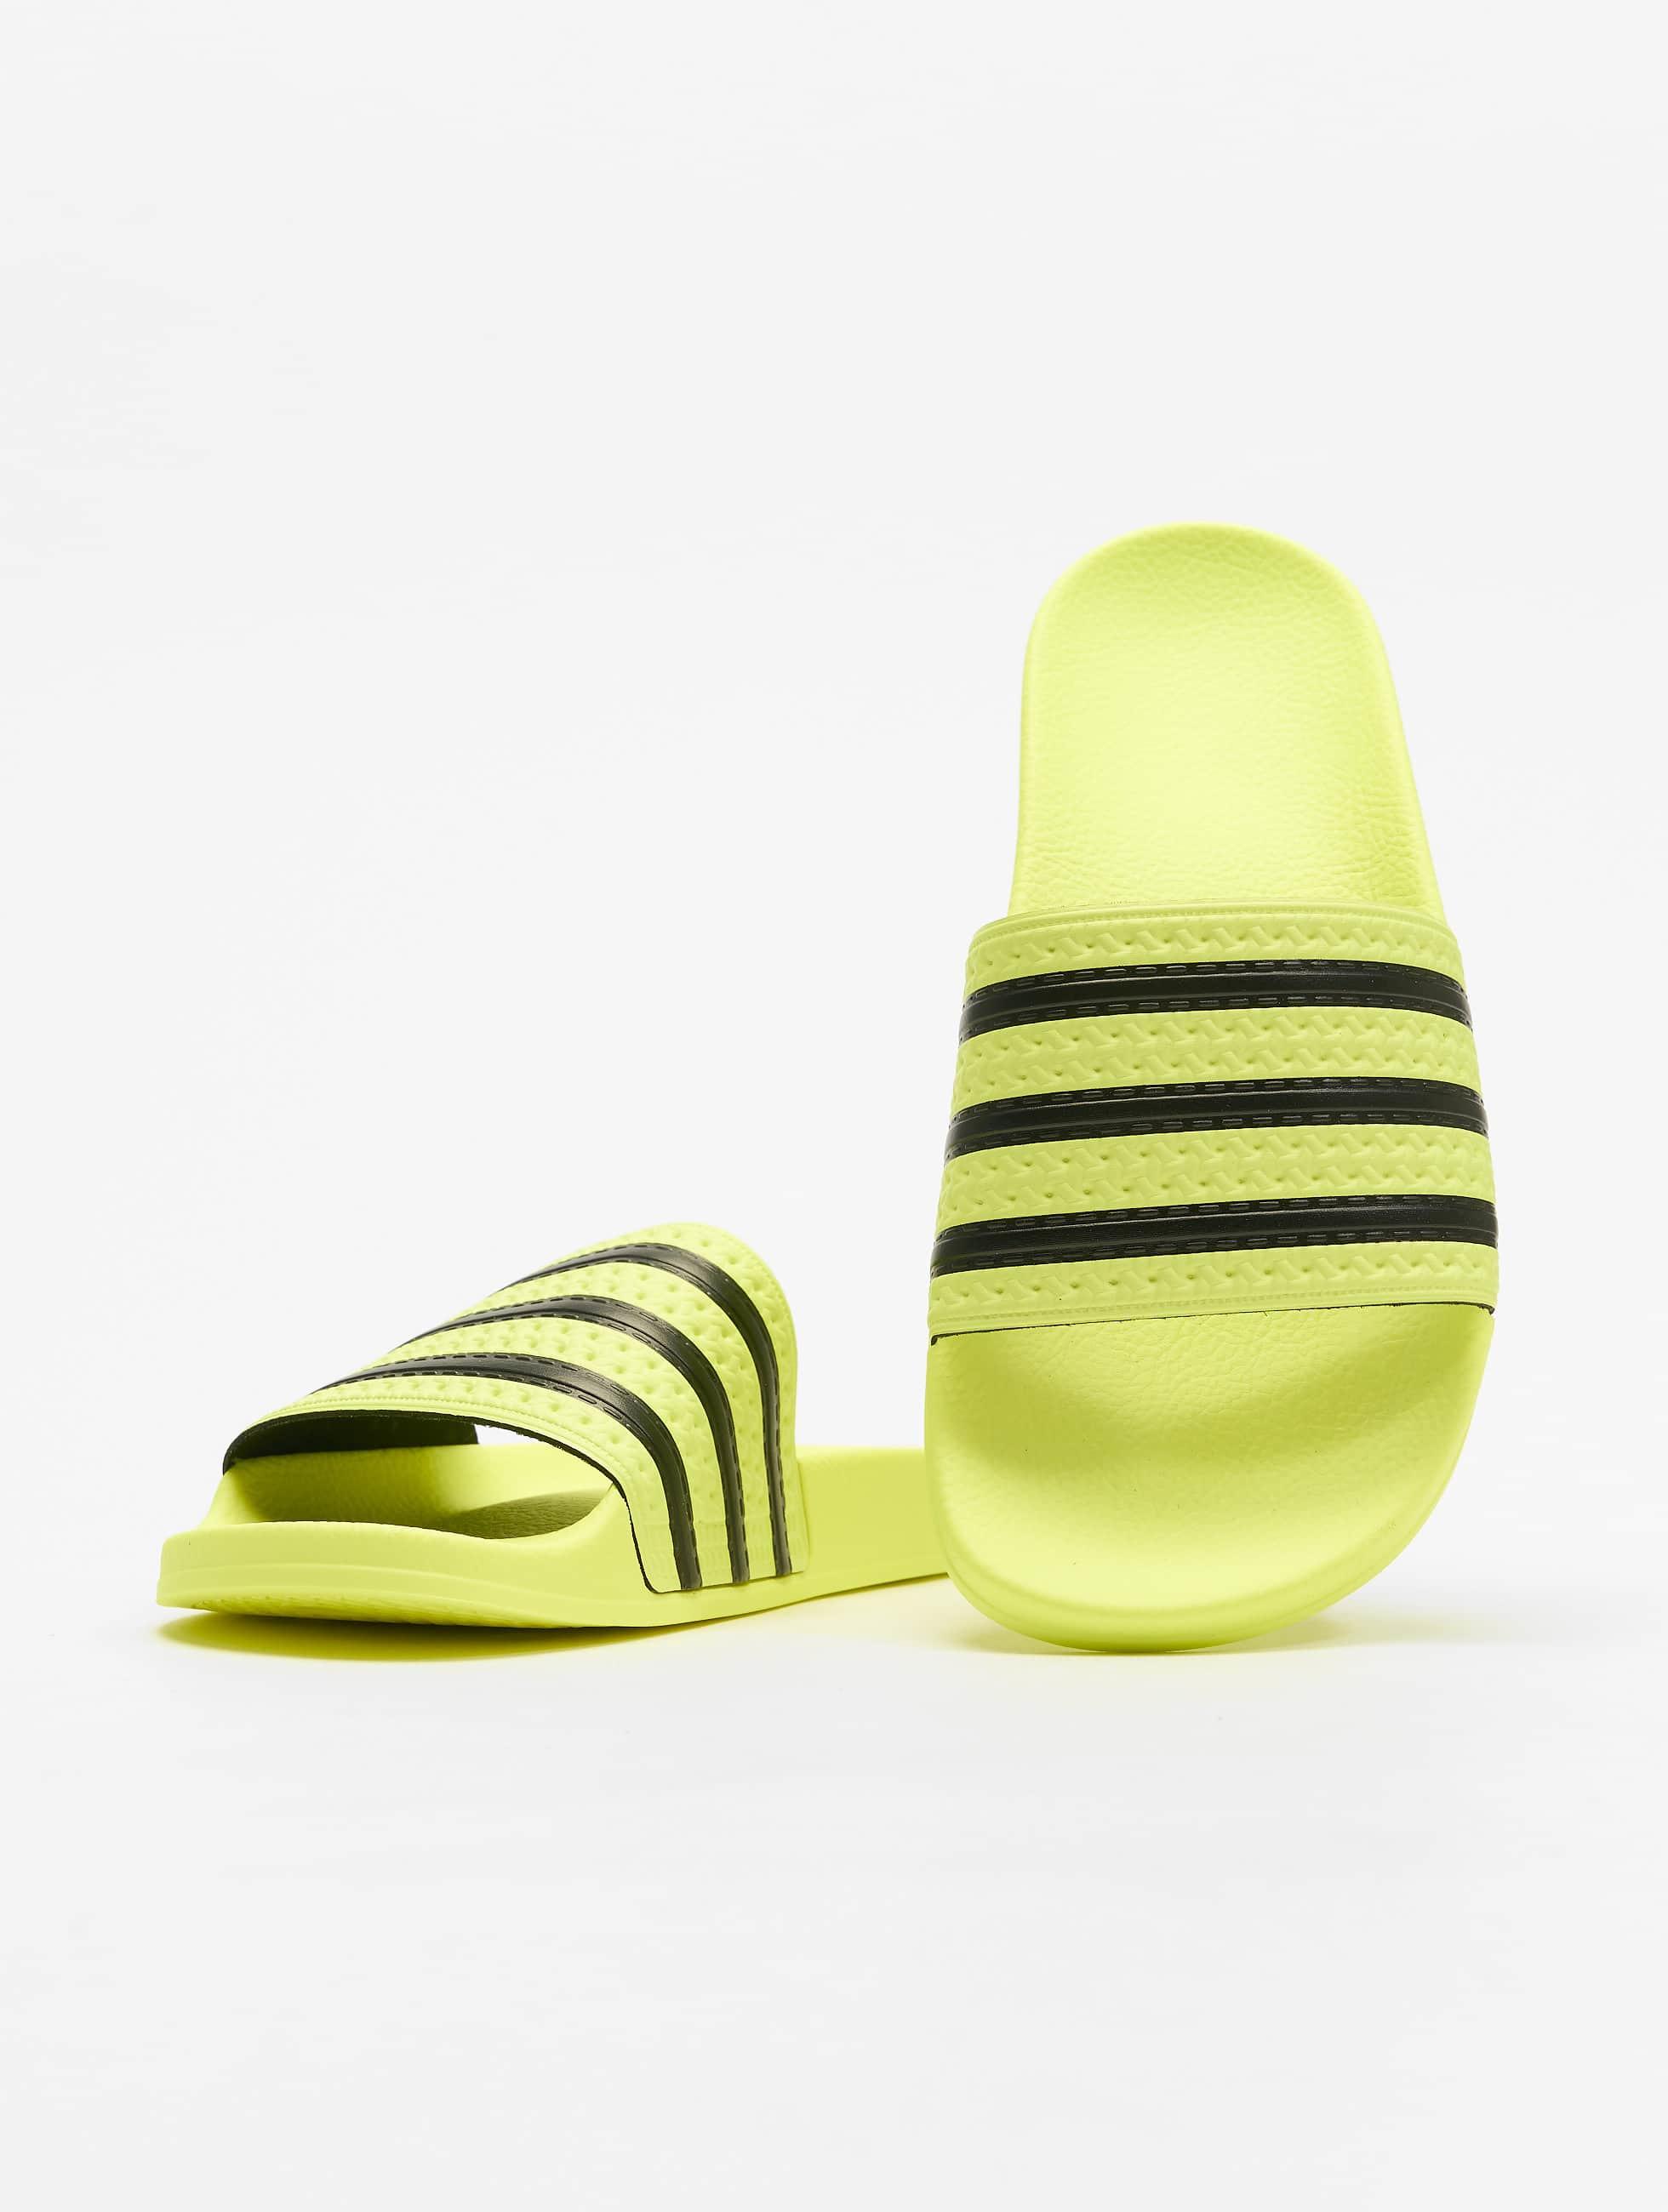 adidas originals Adilette Ice Yellow/Ice Yellow/Core Black